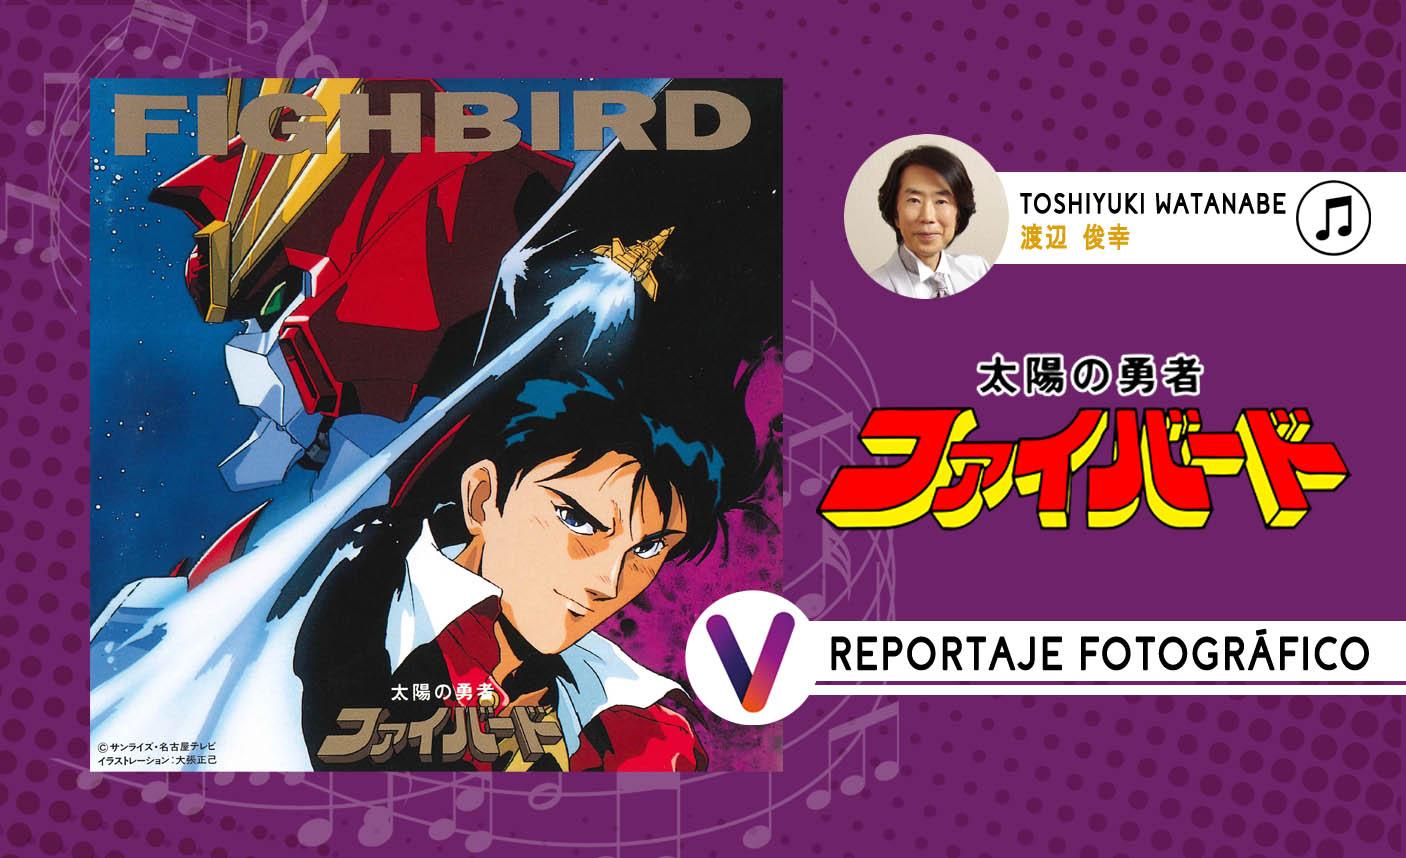 fighbird-banner-reportaje-bv.jpg